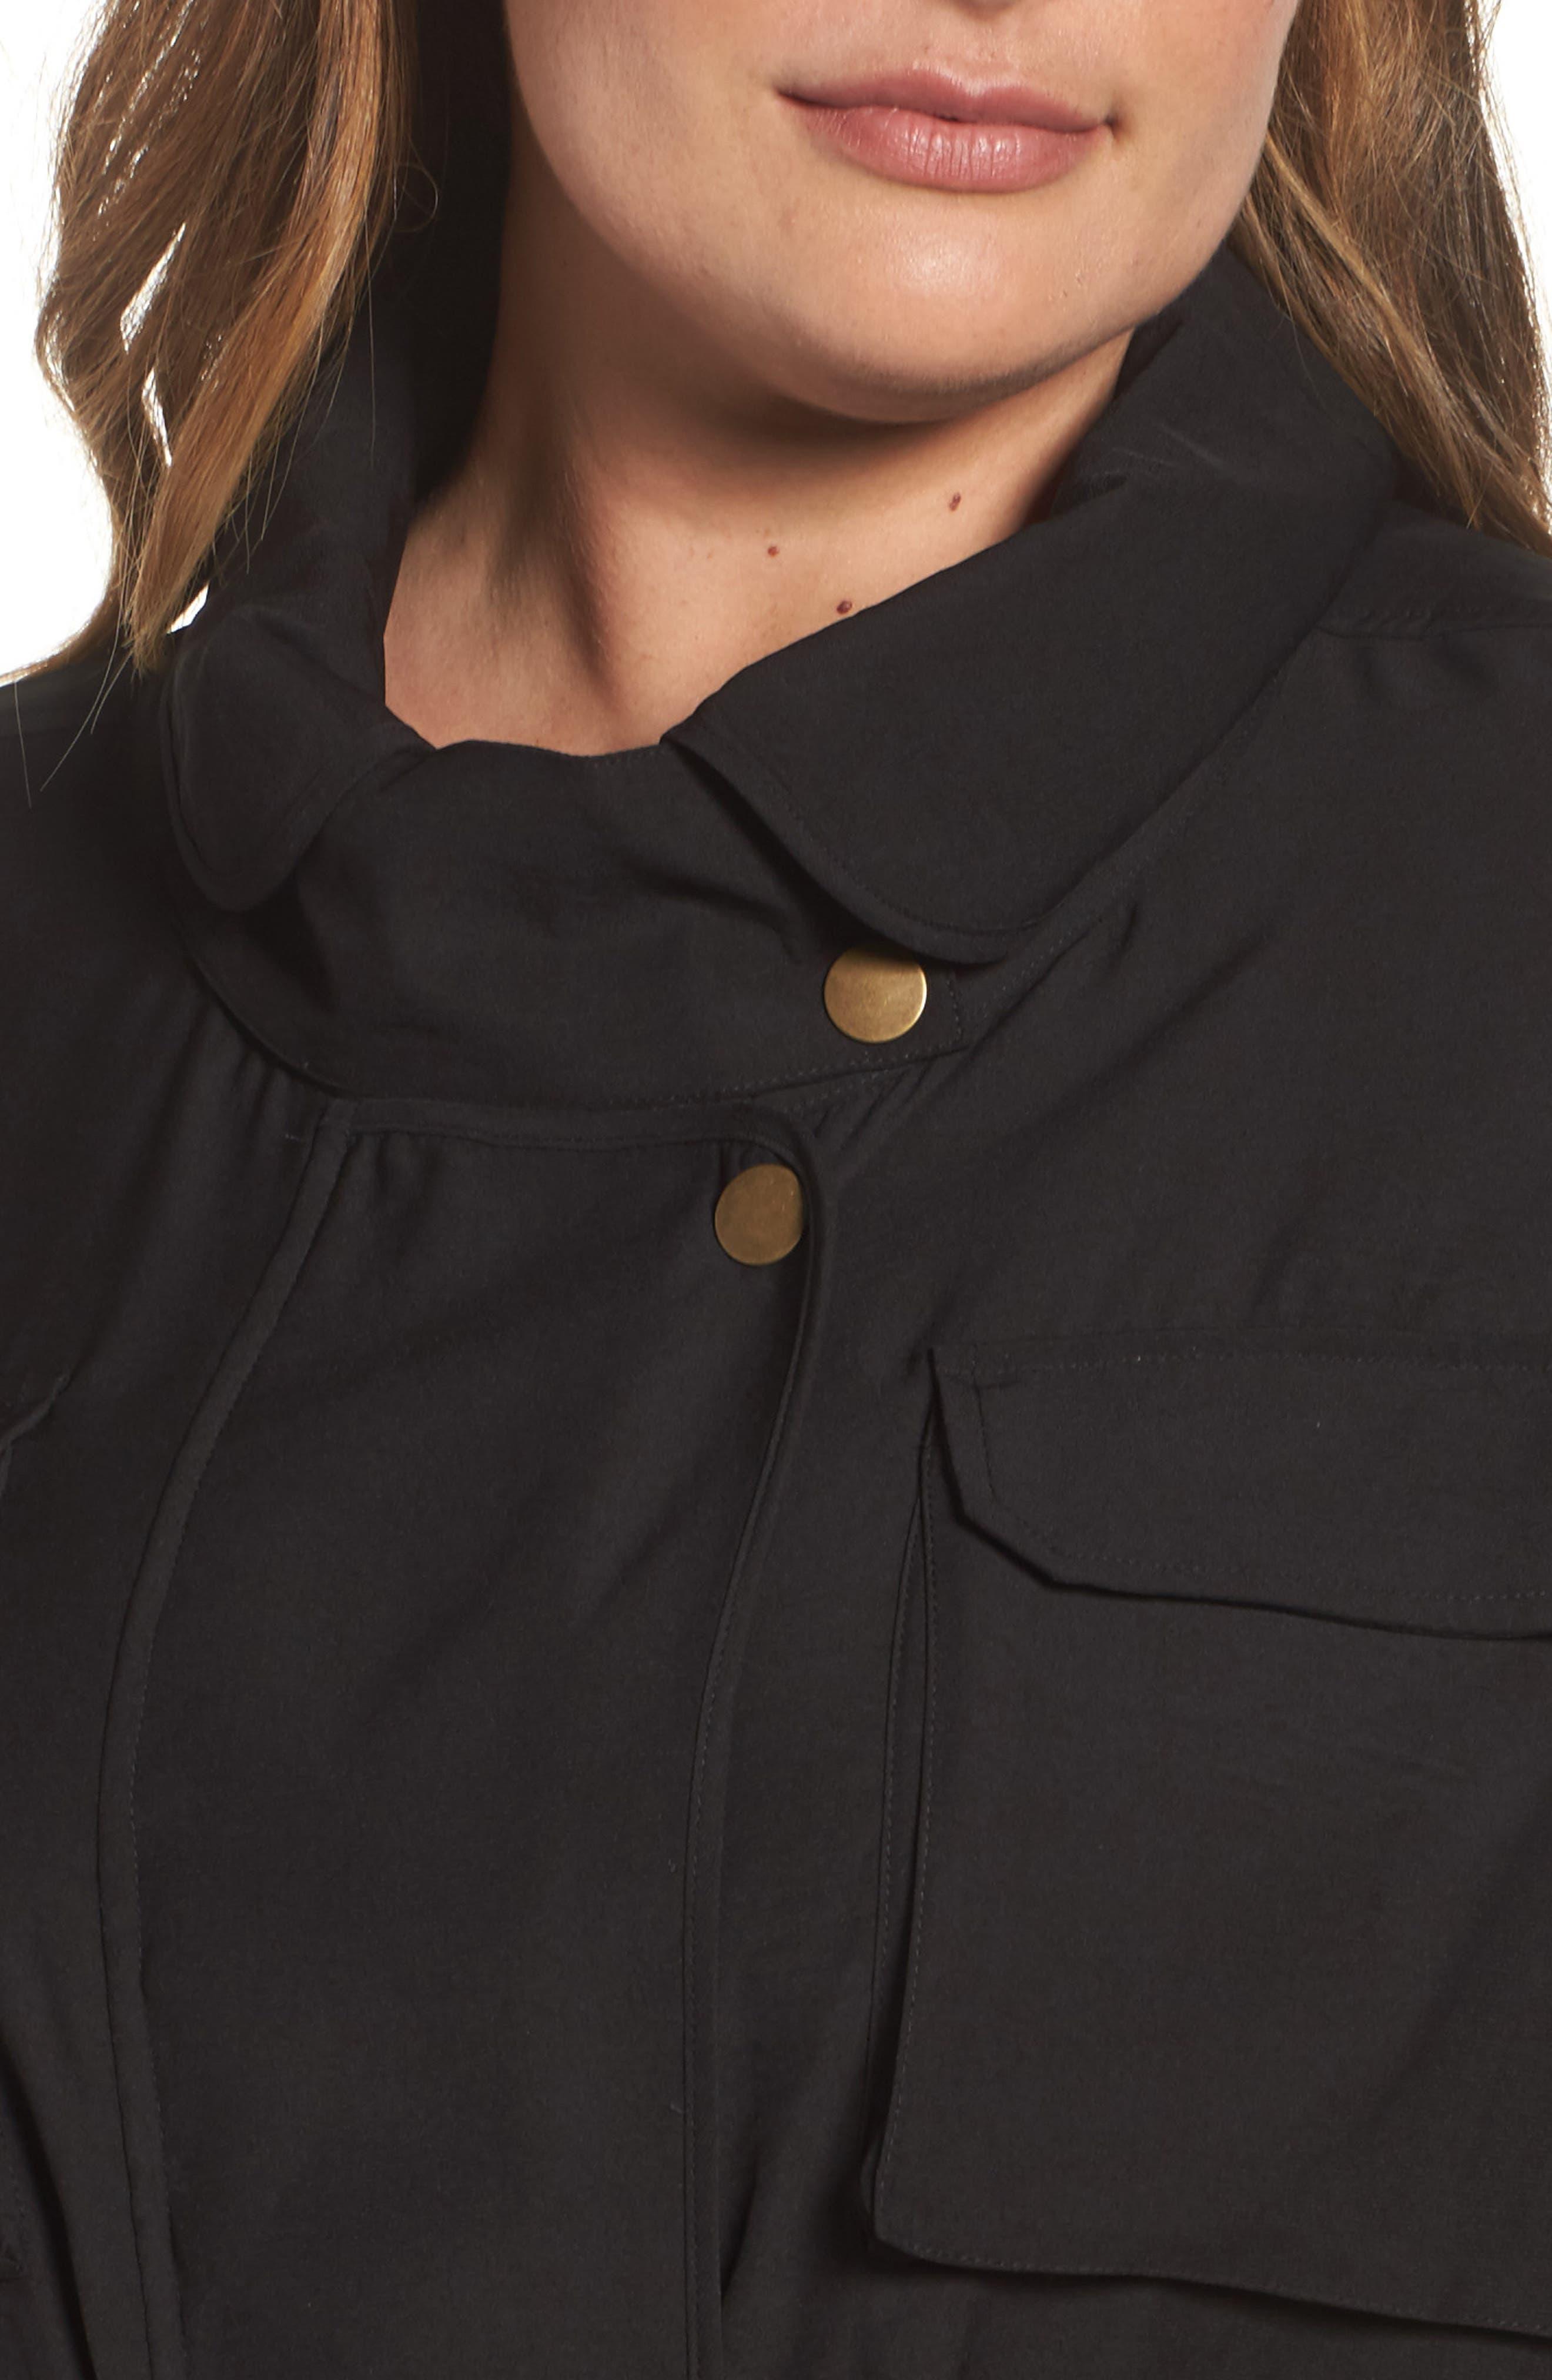 Utility Jacket,                             Alternate thumbnail 4, color,                             Black